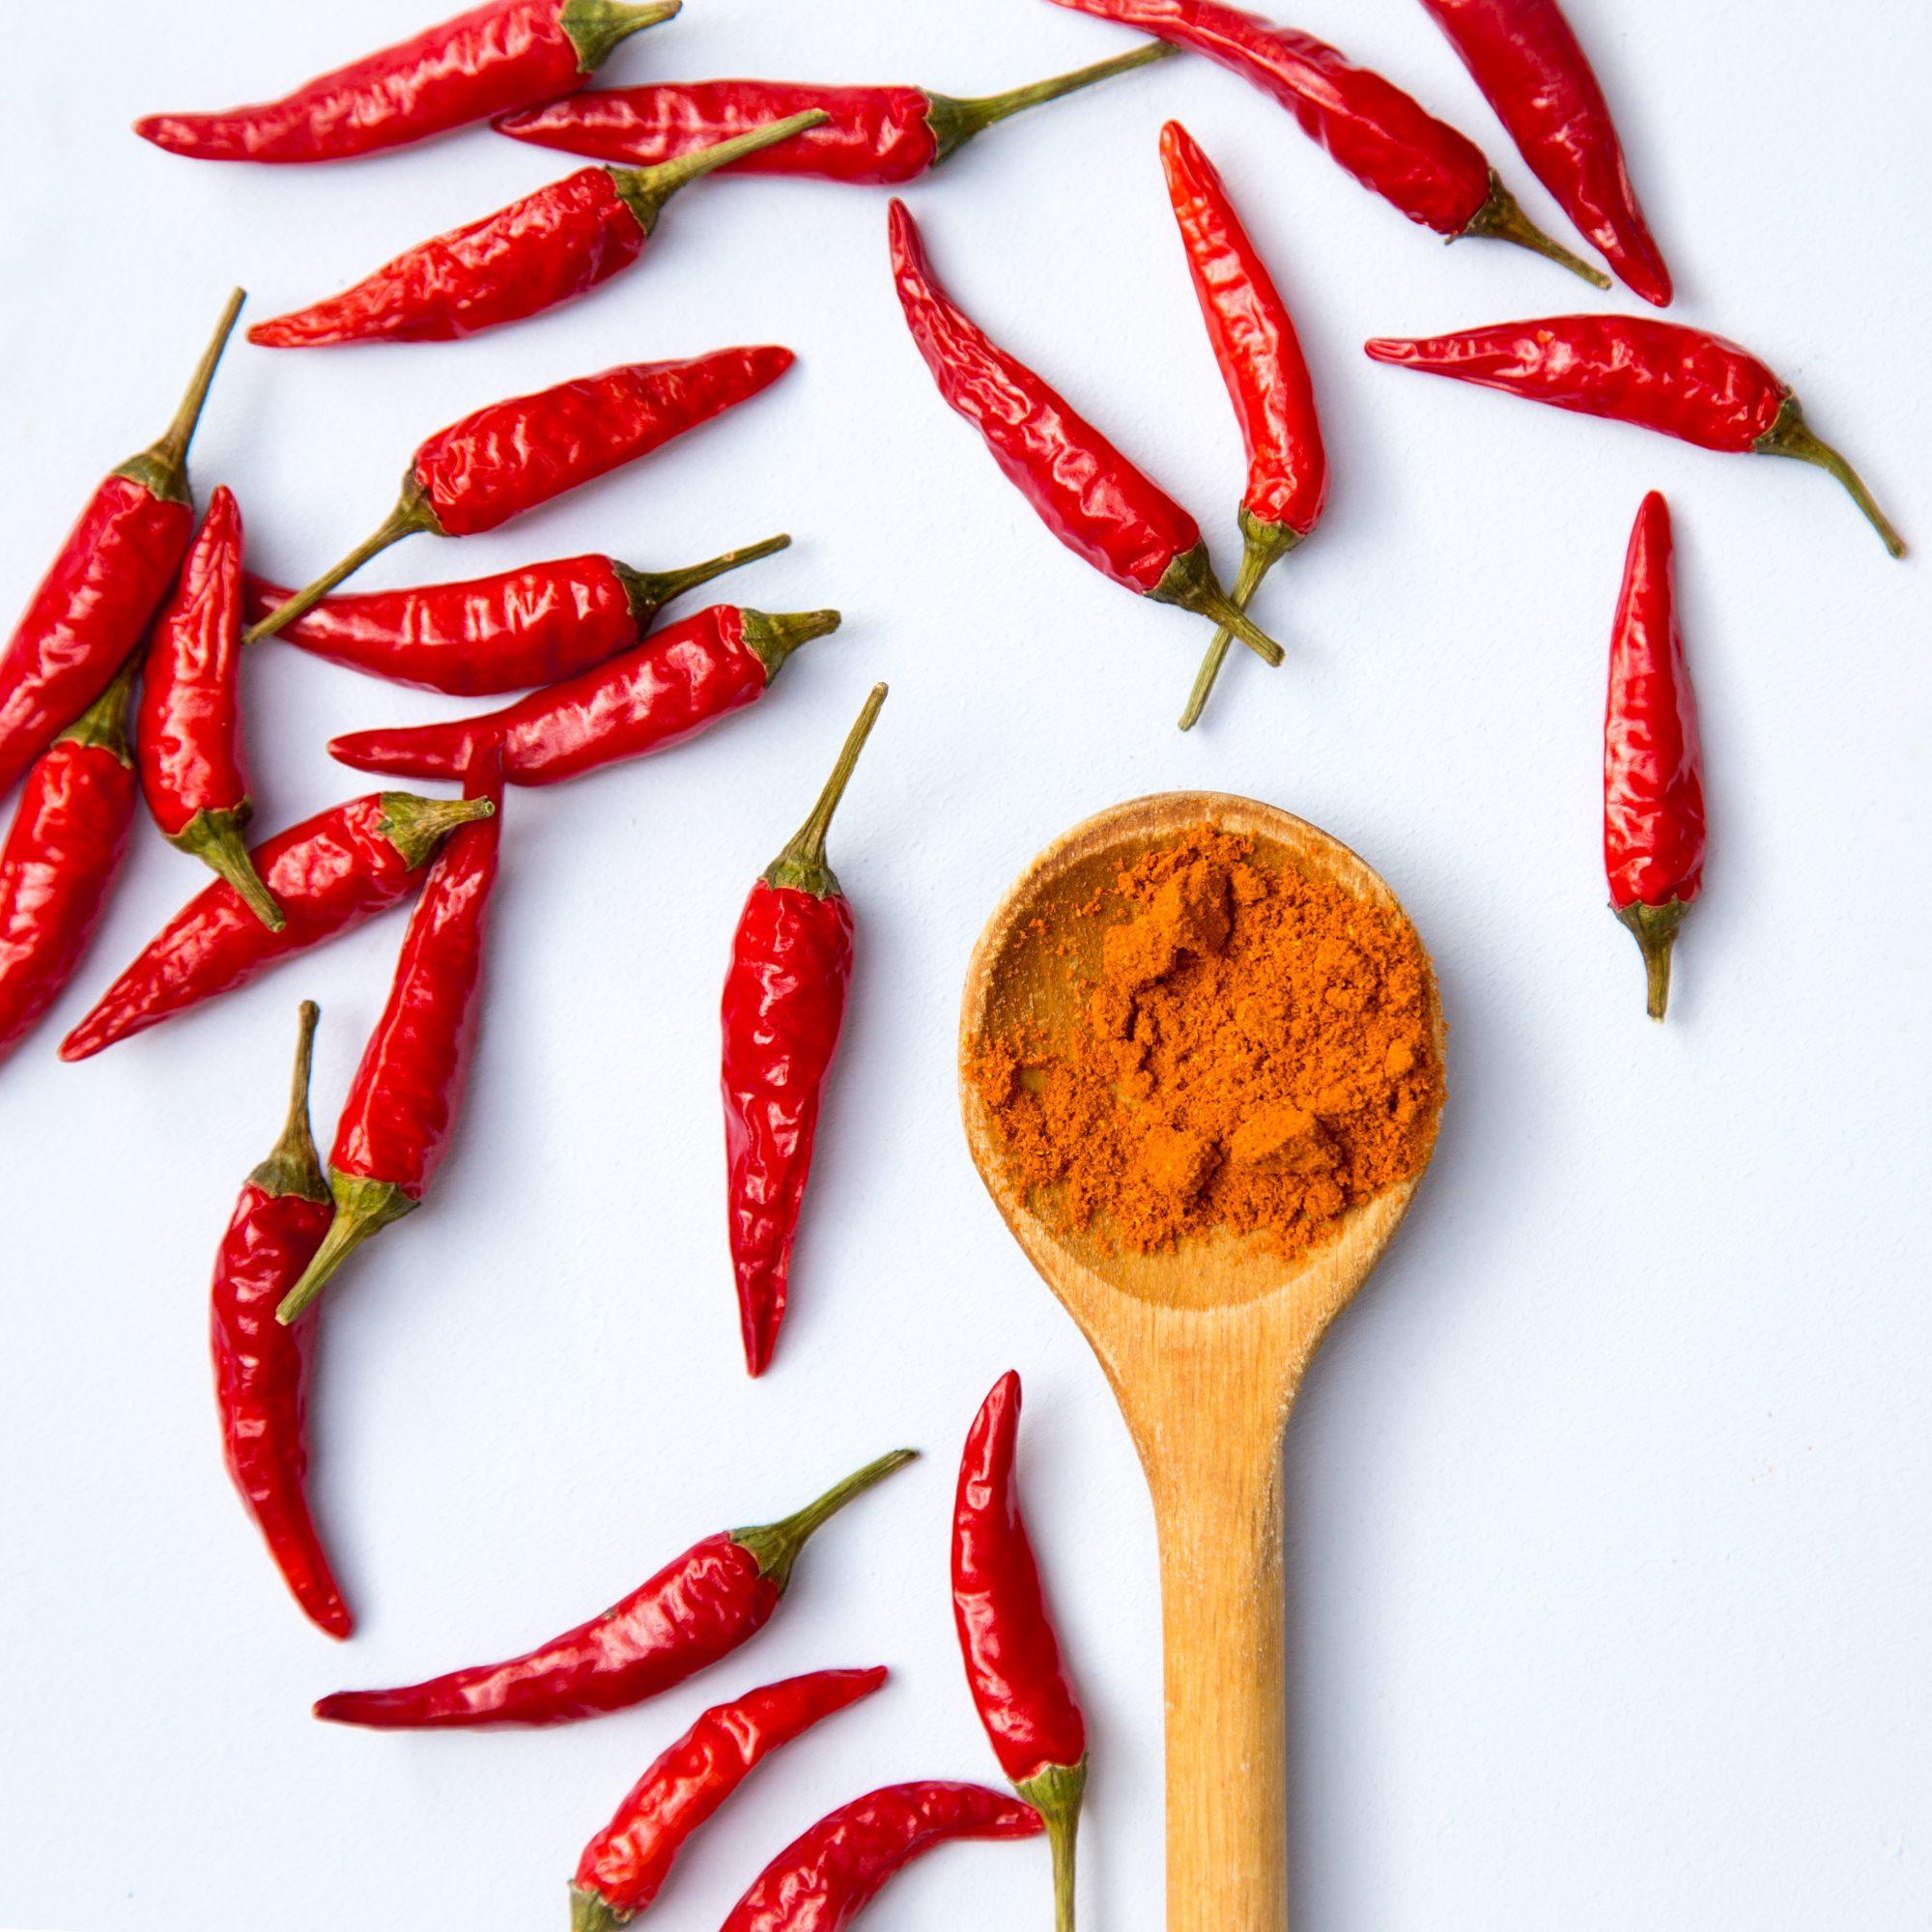 Chili or Cayenne Pepper